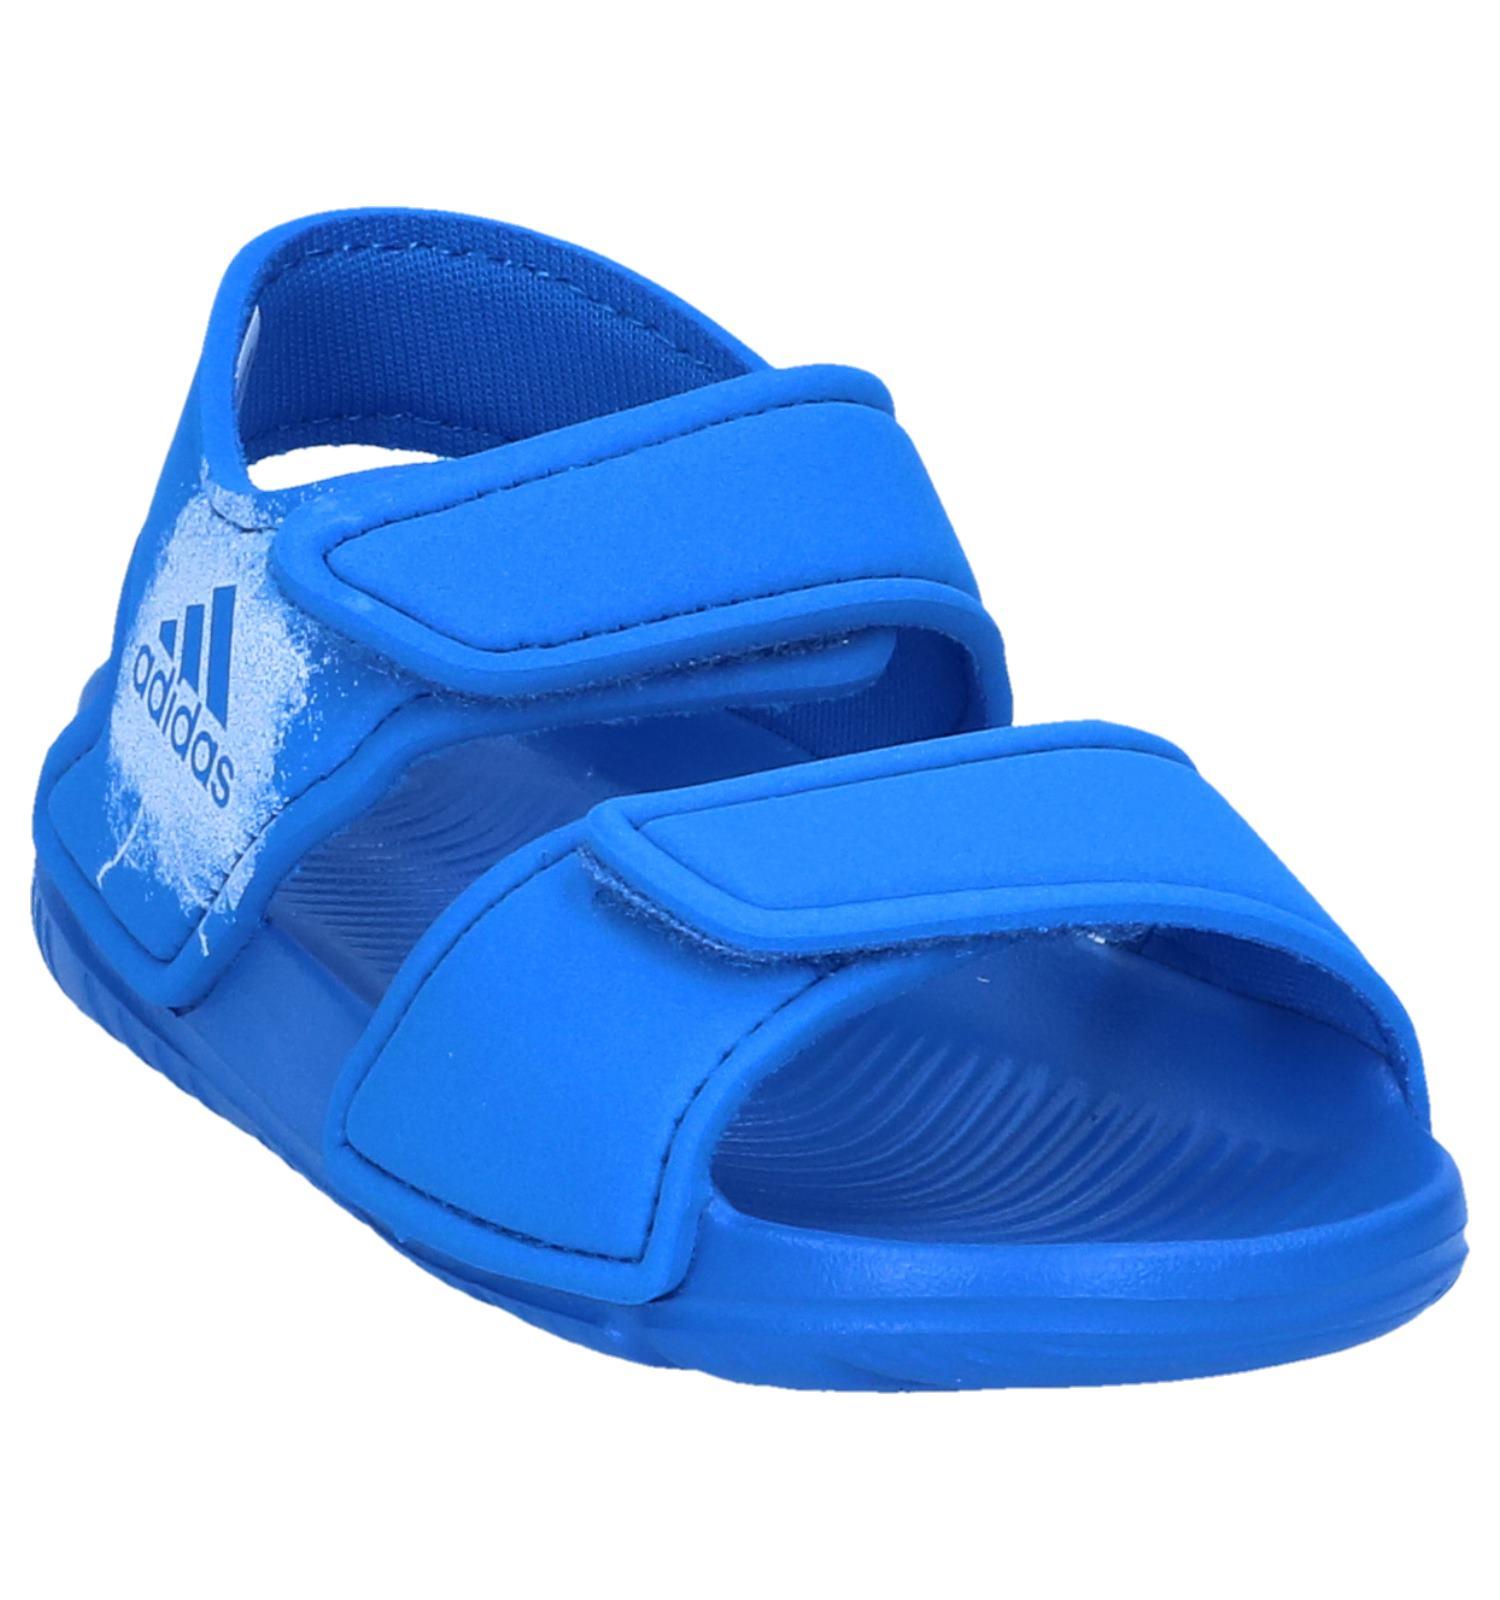 new styles 3e85a a8d0e Blauwe Watersandalen adidas Altaswim  TORFS.BE  Gratis verzend en retour